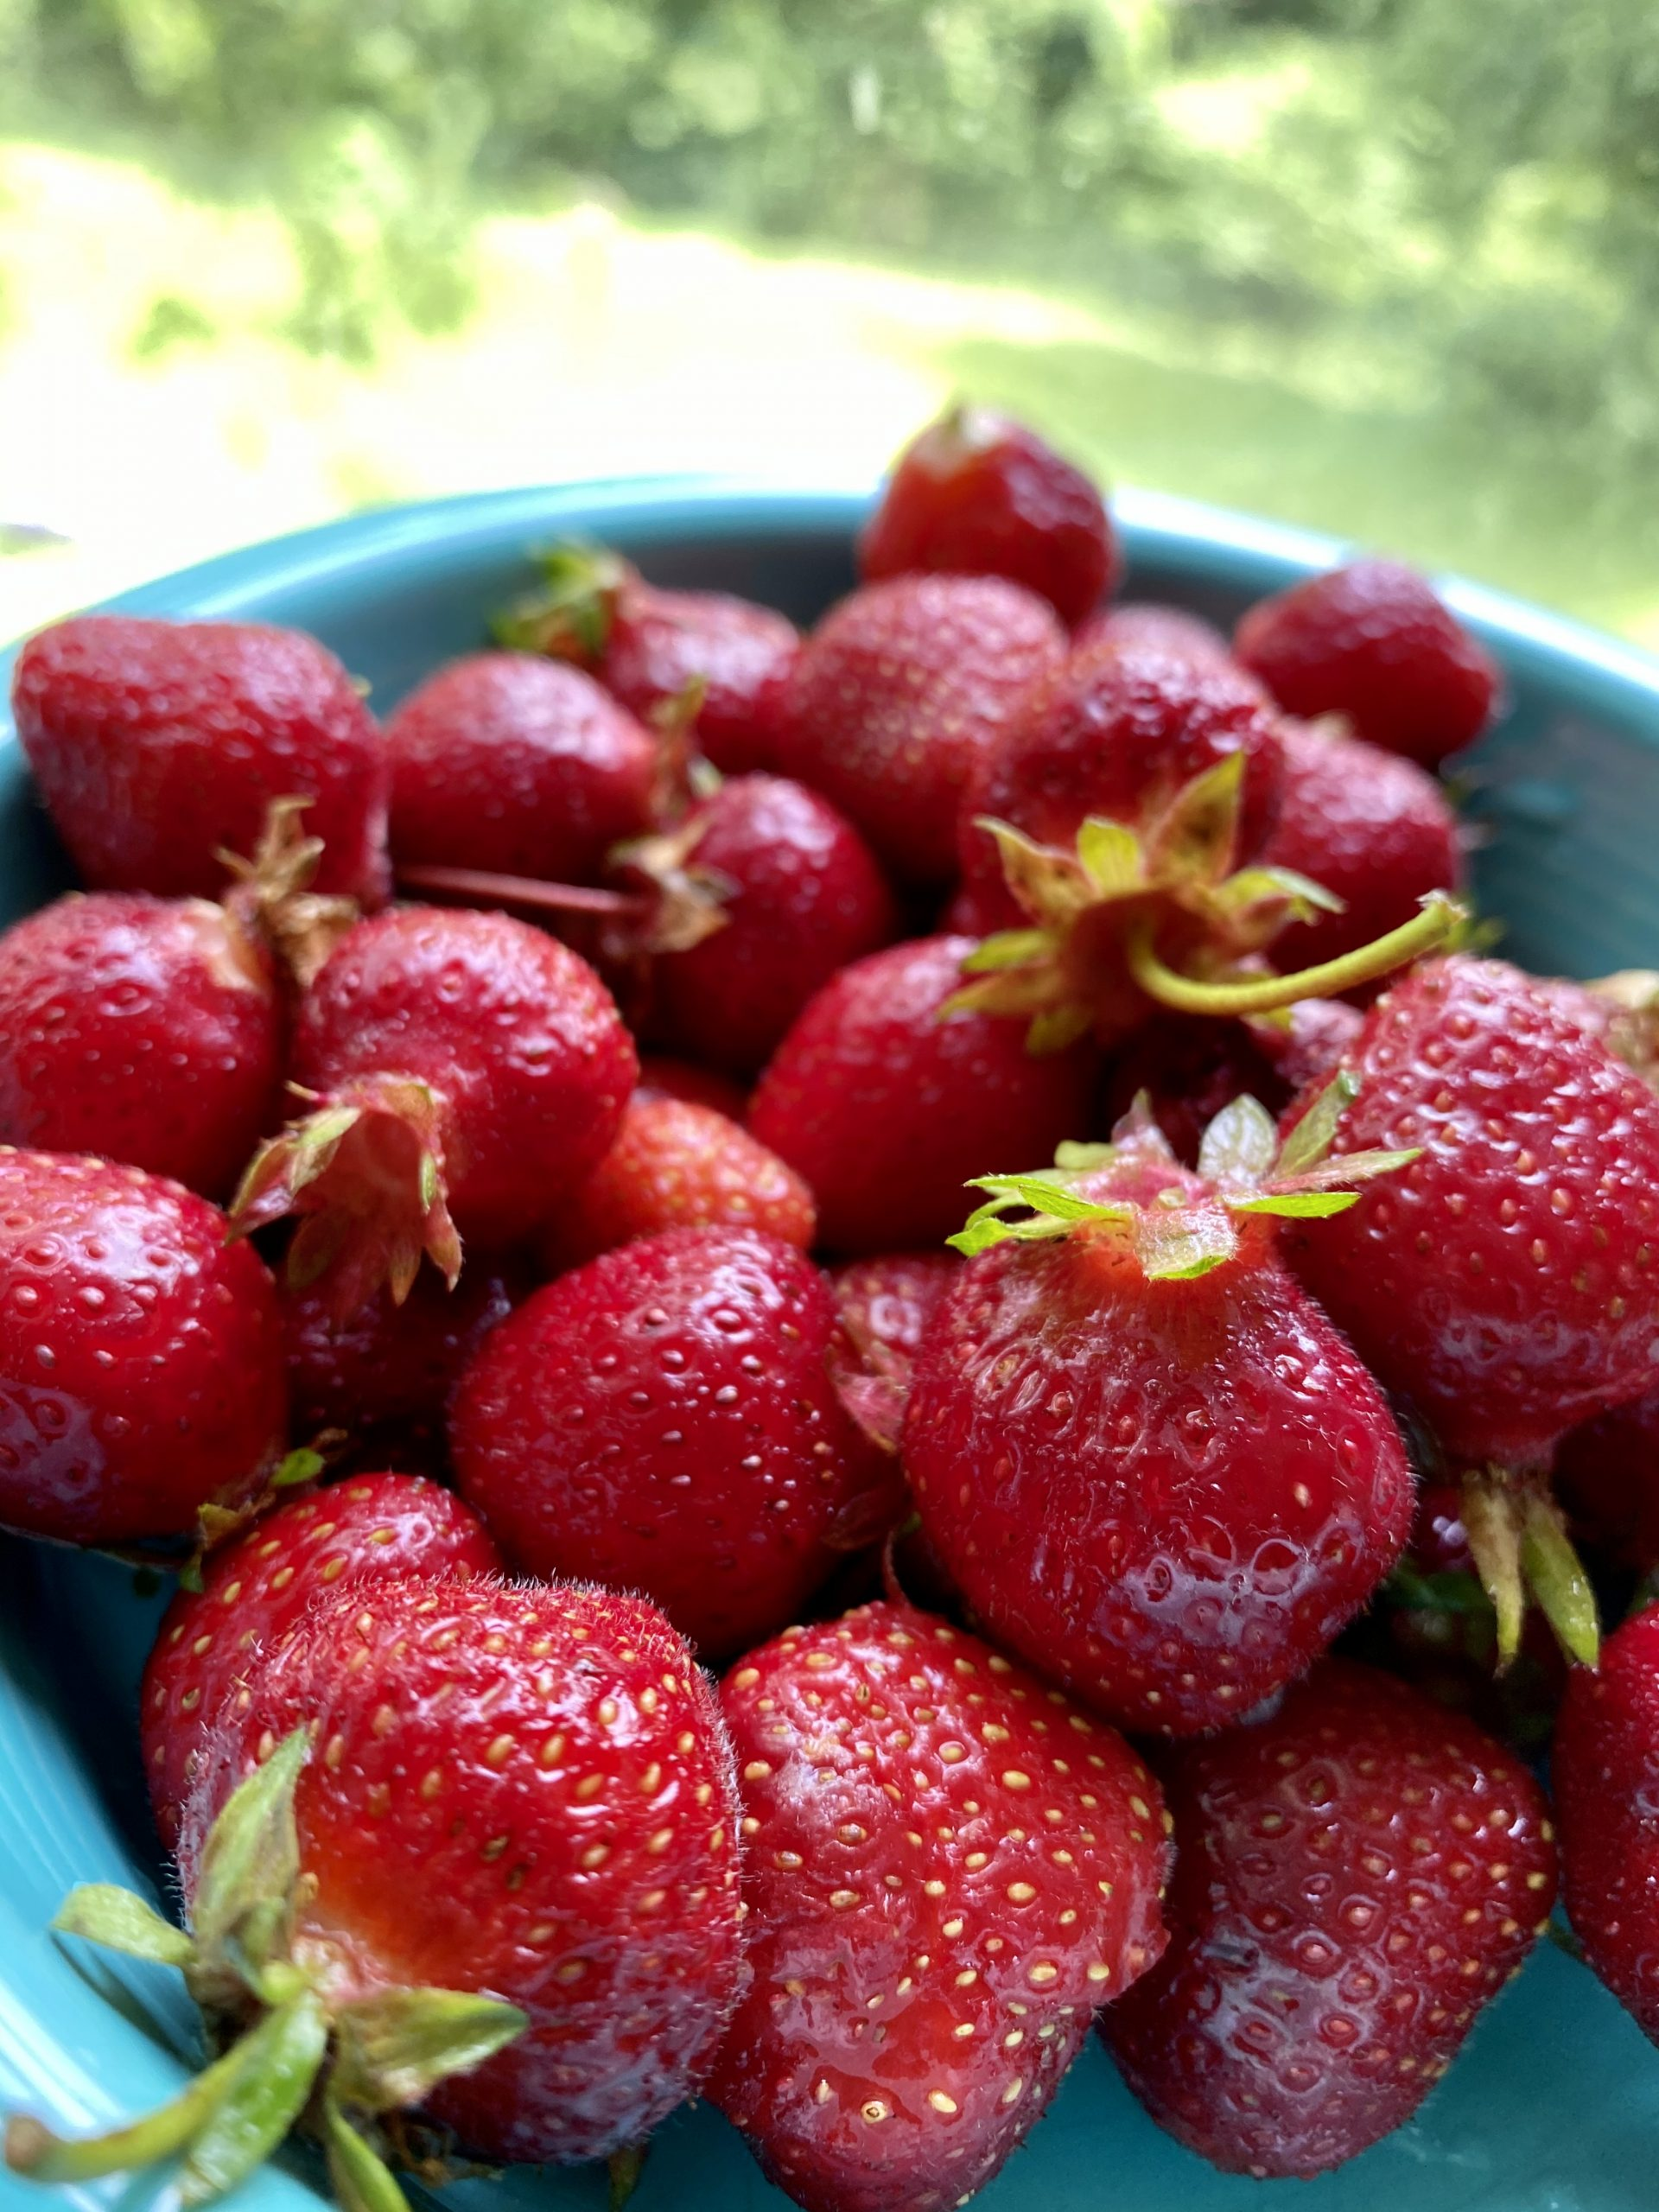 WV strawberries